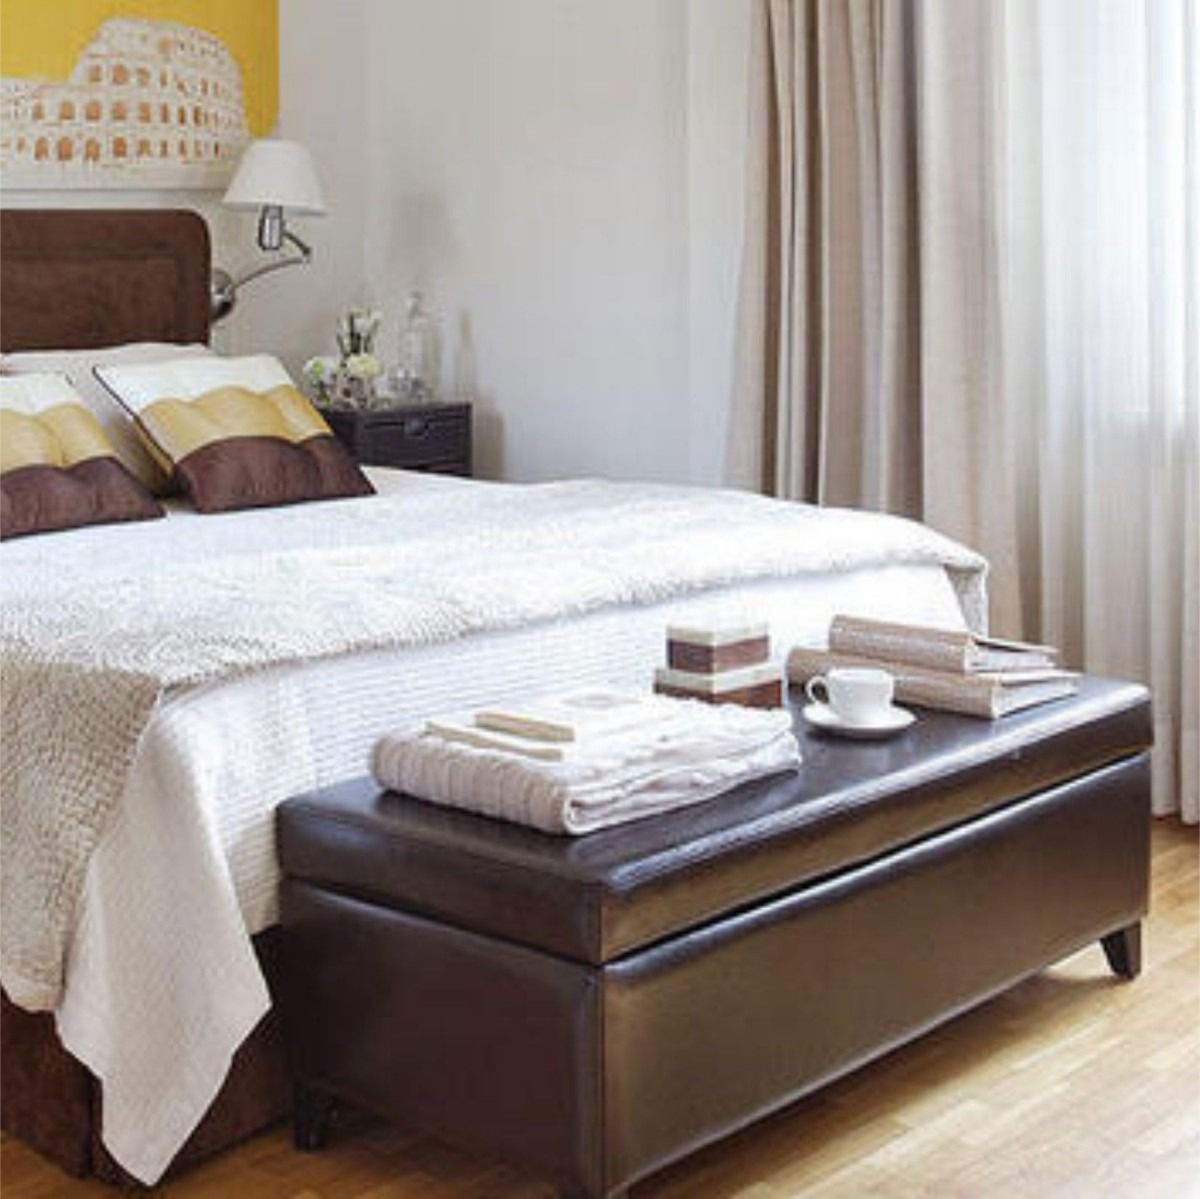 Pie de cama sommier ba l banqueta zapatero 1 2 m diqua en mercadolibre ideas para - Baul zapatero ...